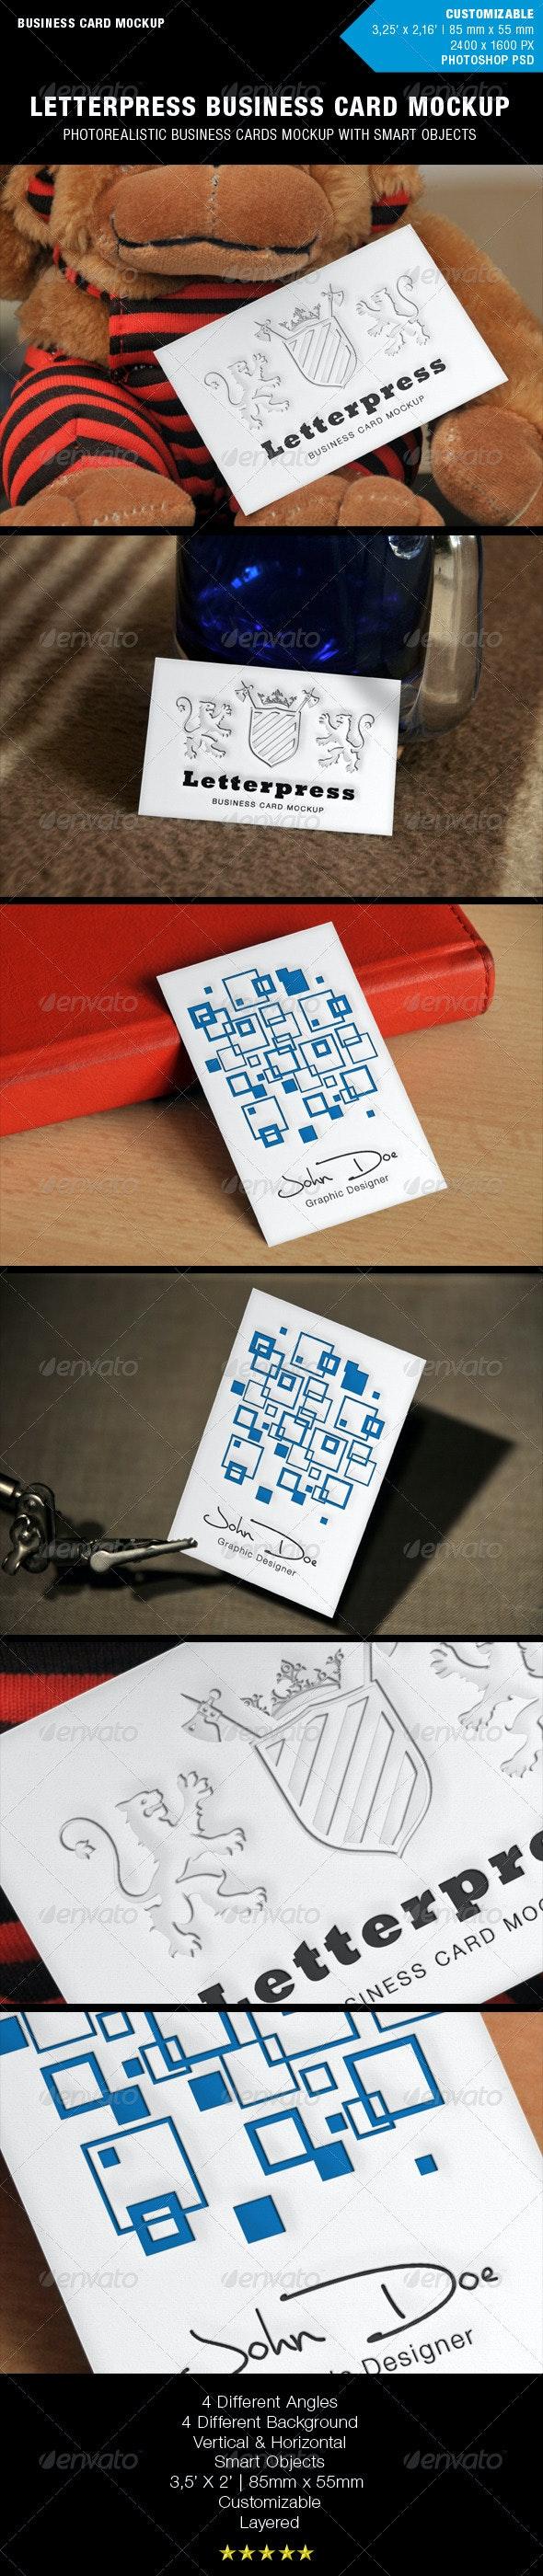 Letterpress Business Card Mockup - Business Cards Print